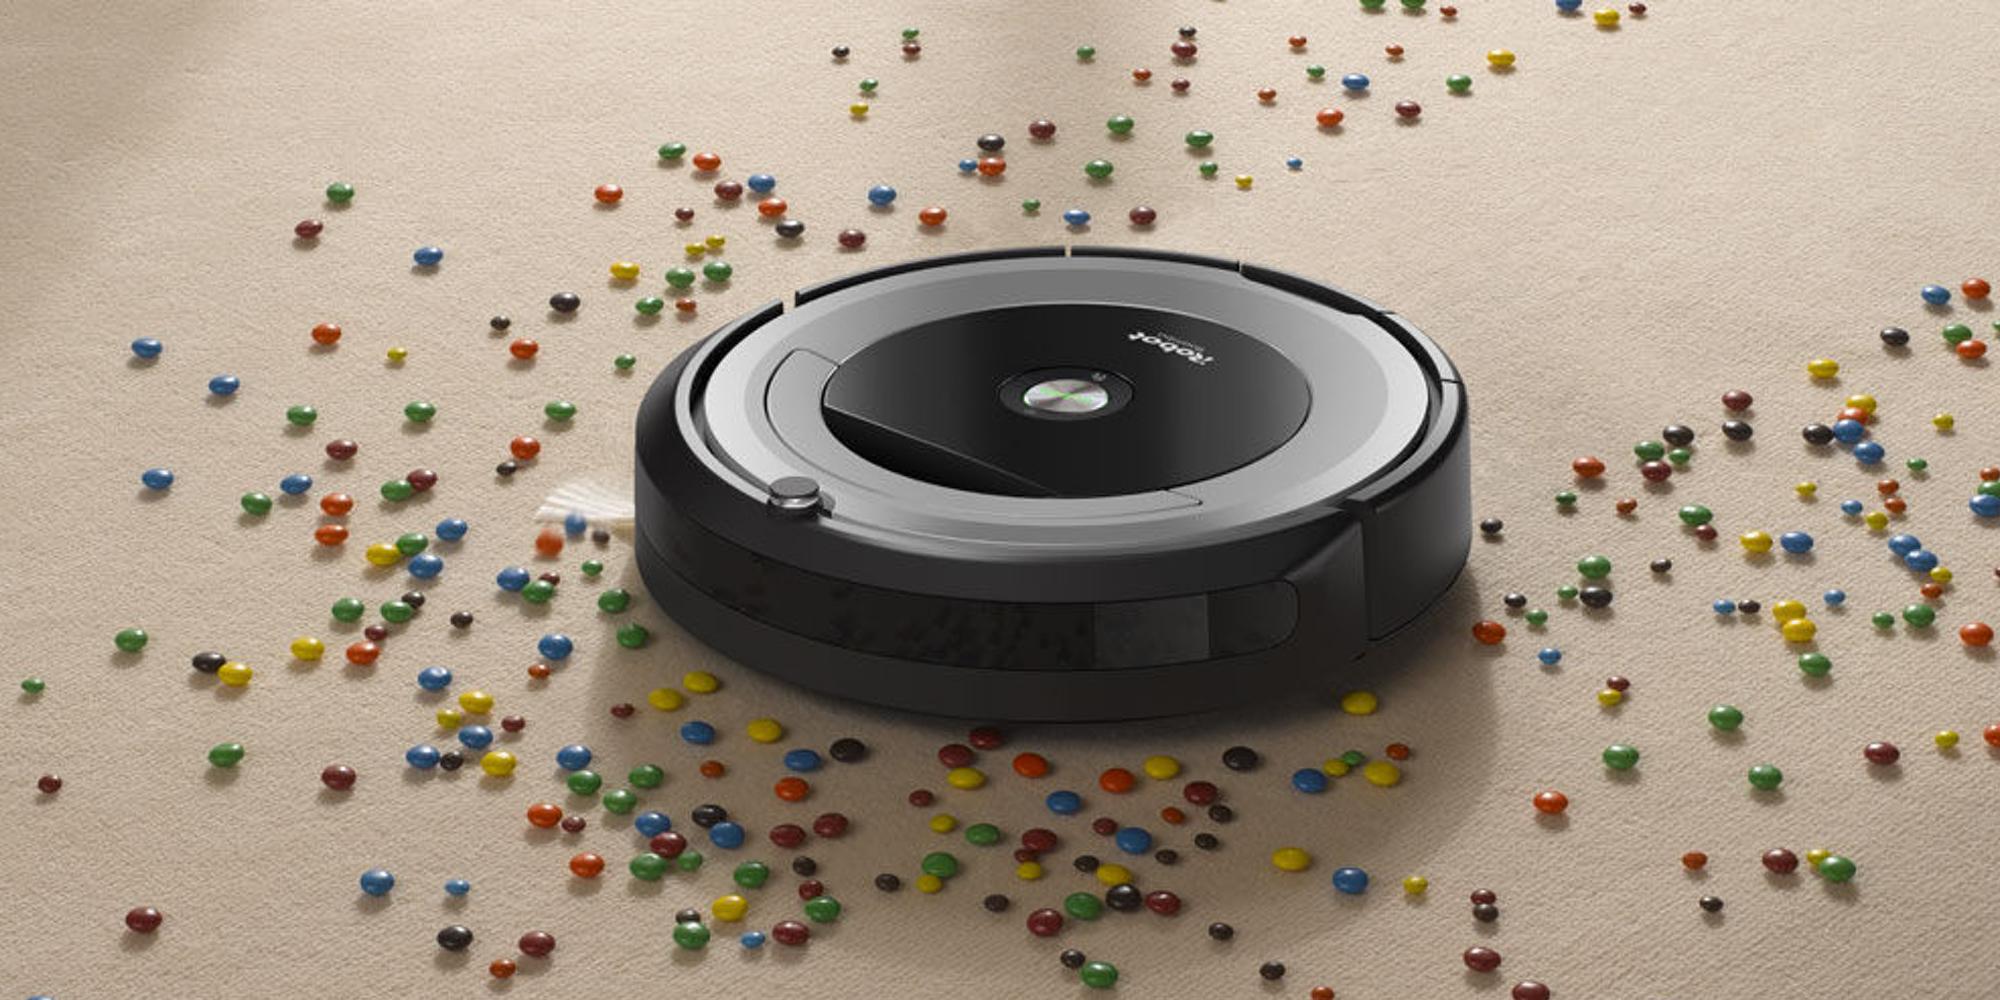 Control the $248 iRobot Roomba 690 Robot Vacuum with Alexa or Assistant (Reg. $300)